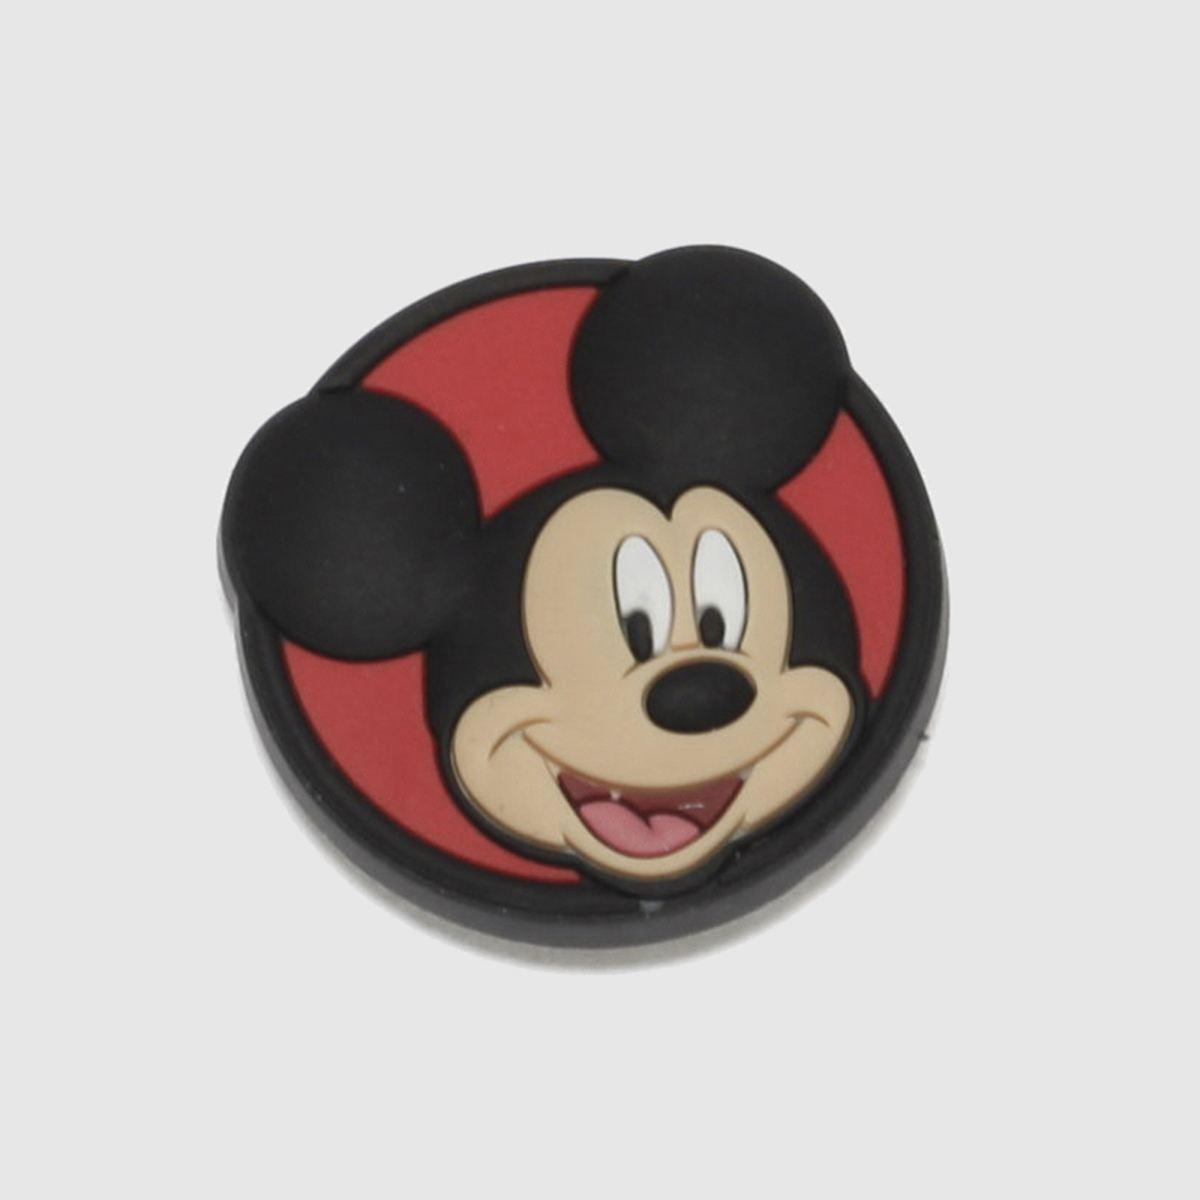 jibbitz Jibbitz Black & Red Mickey